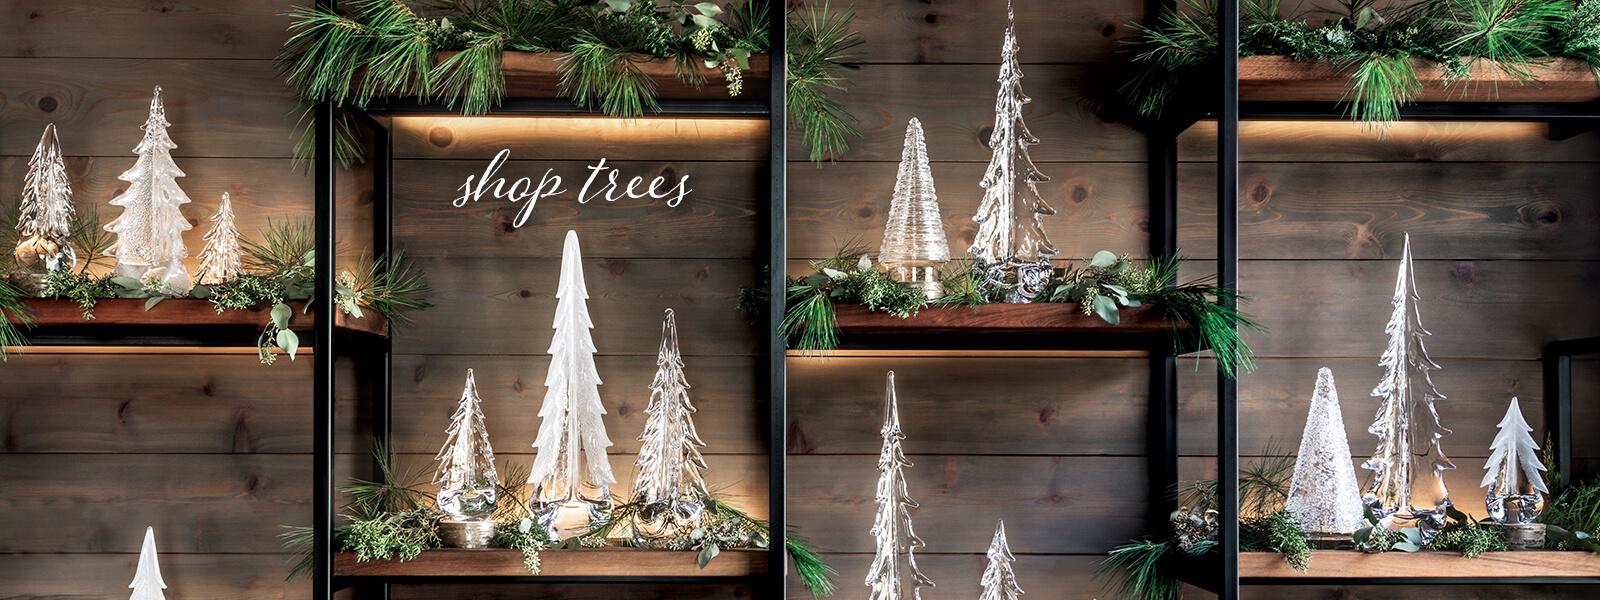 Shop Trees